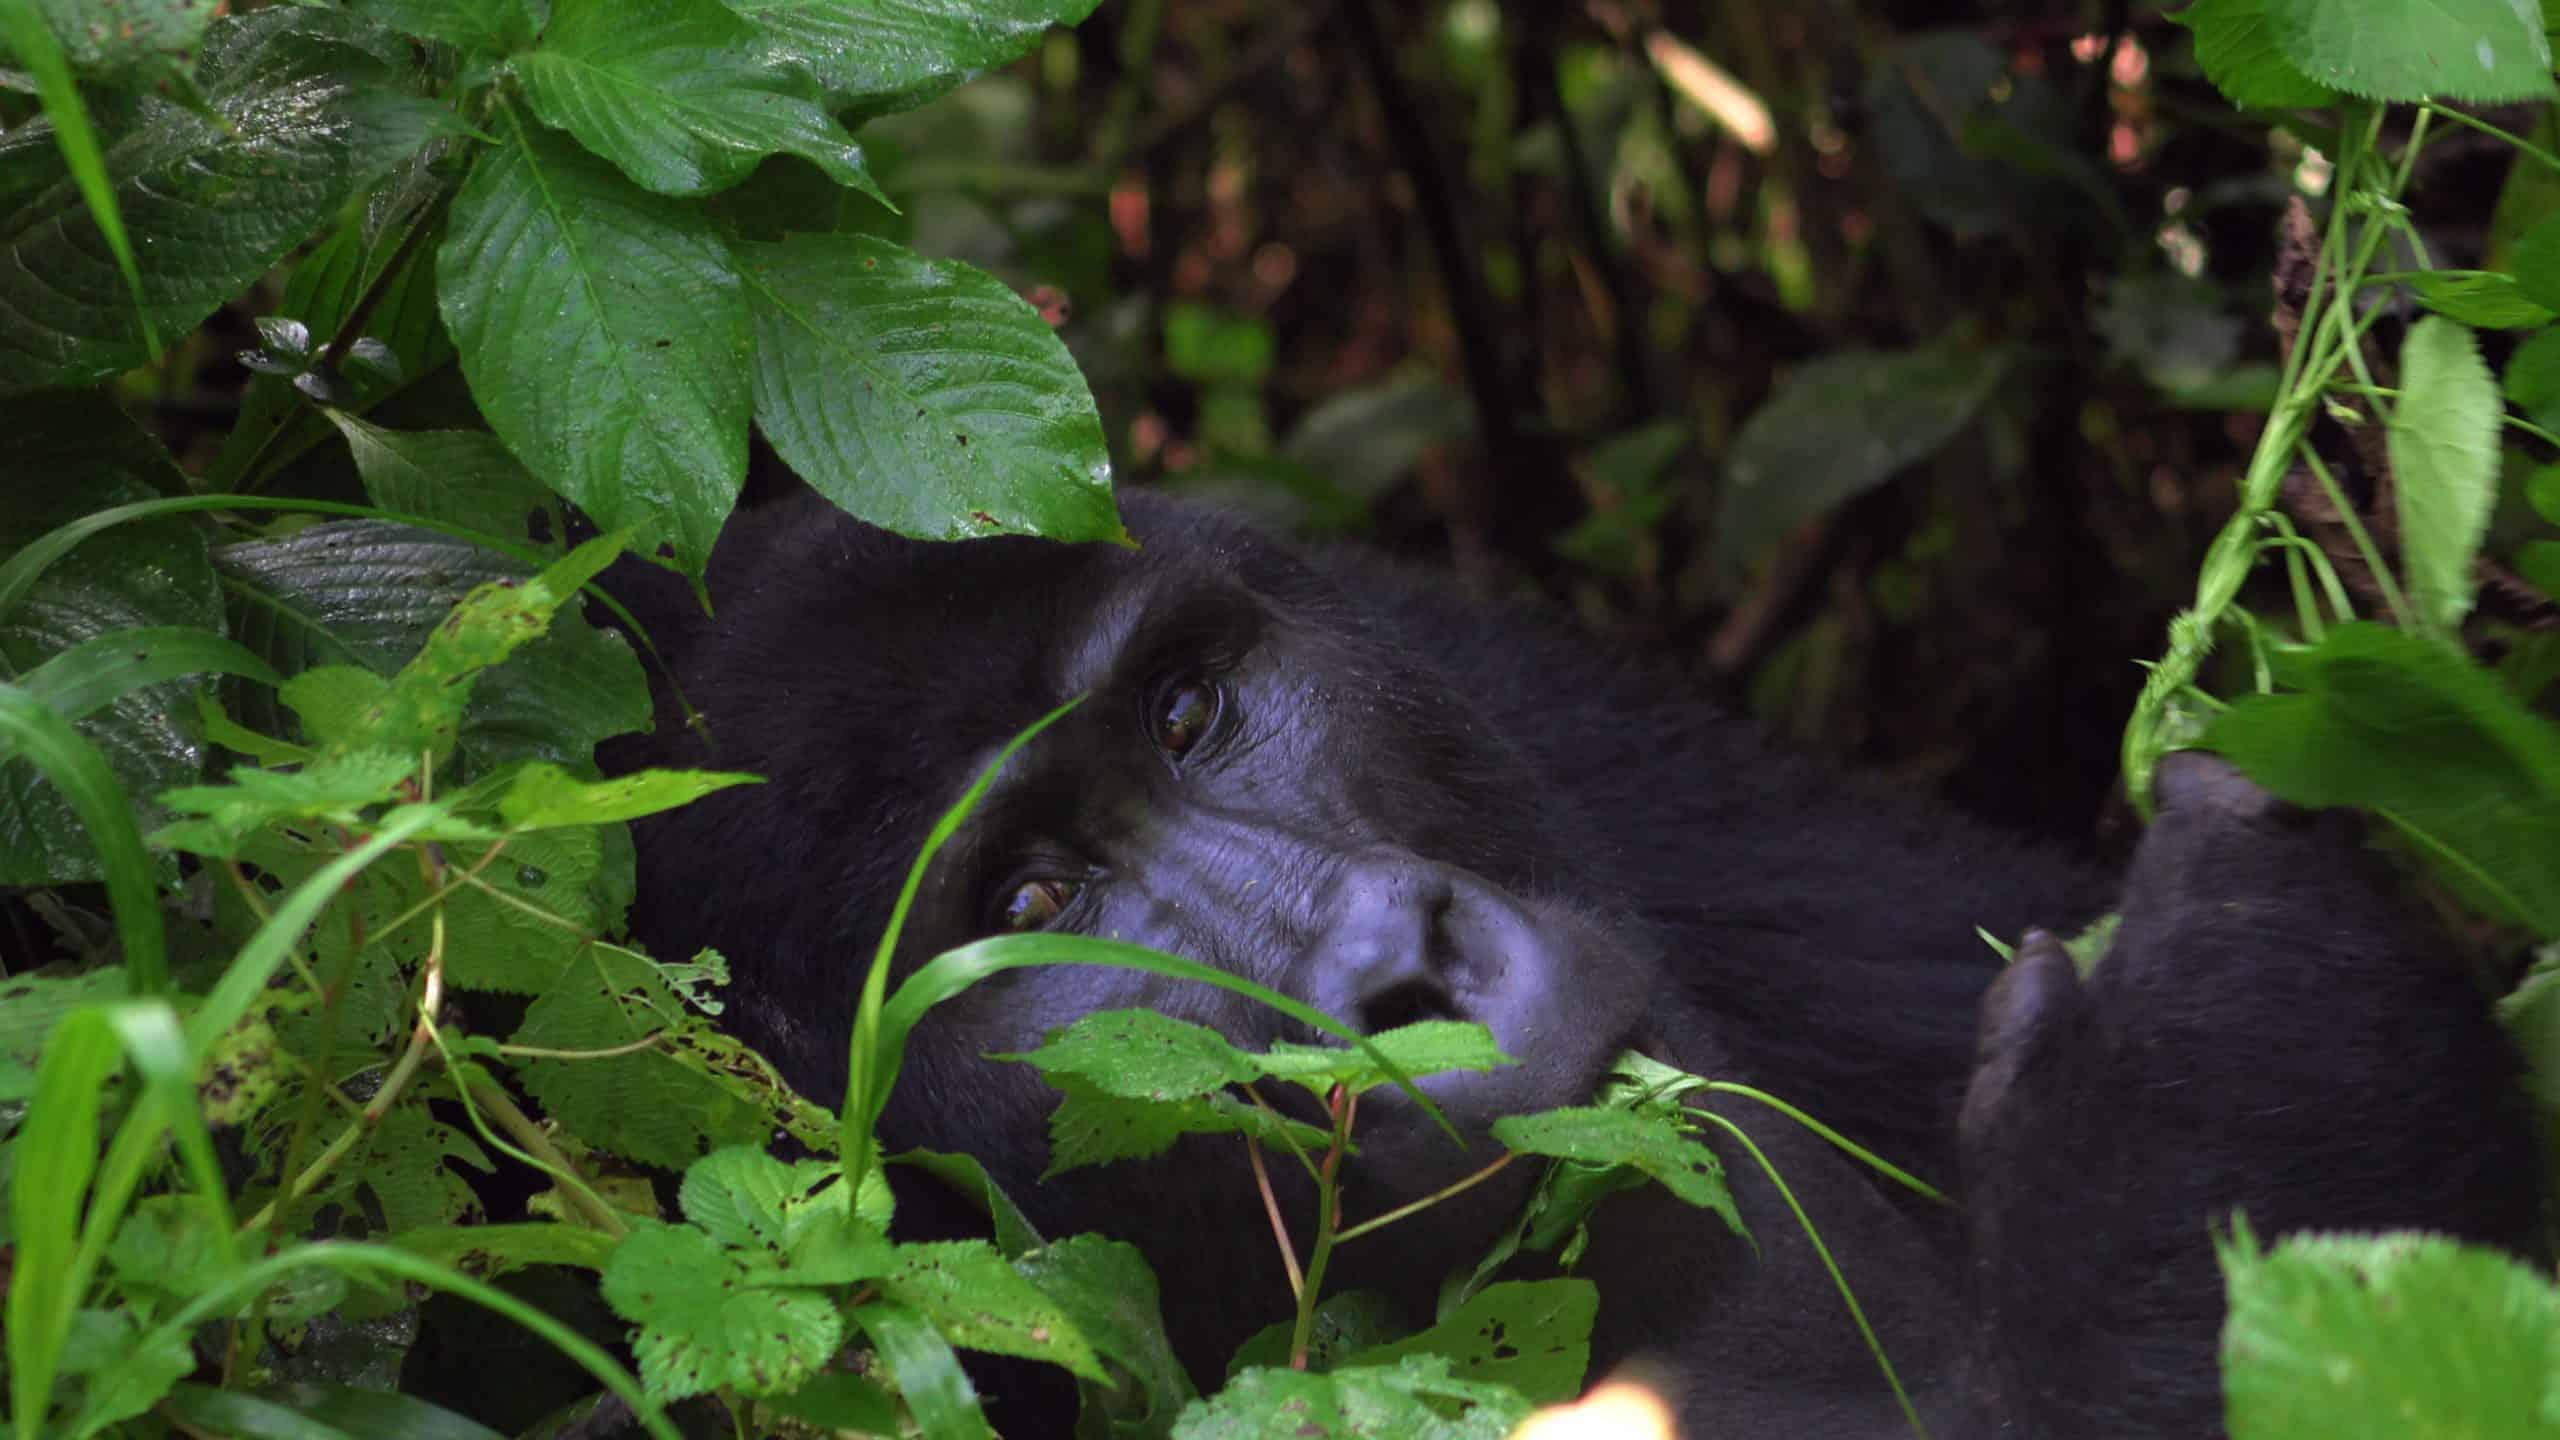 Gorilla Hd 4